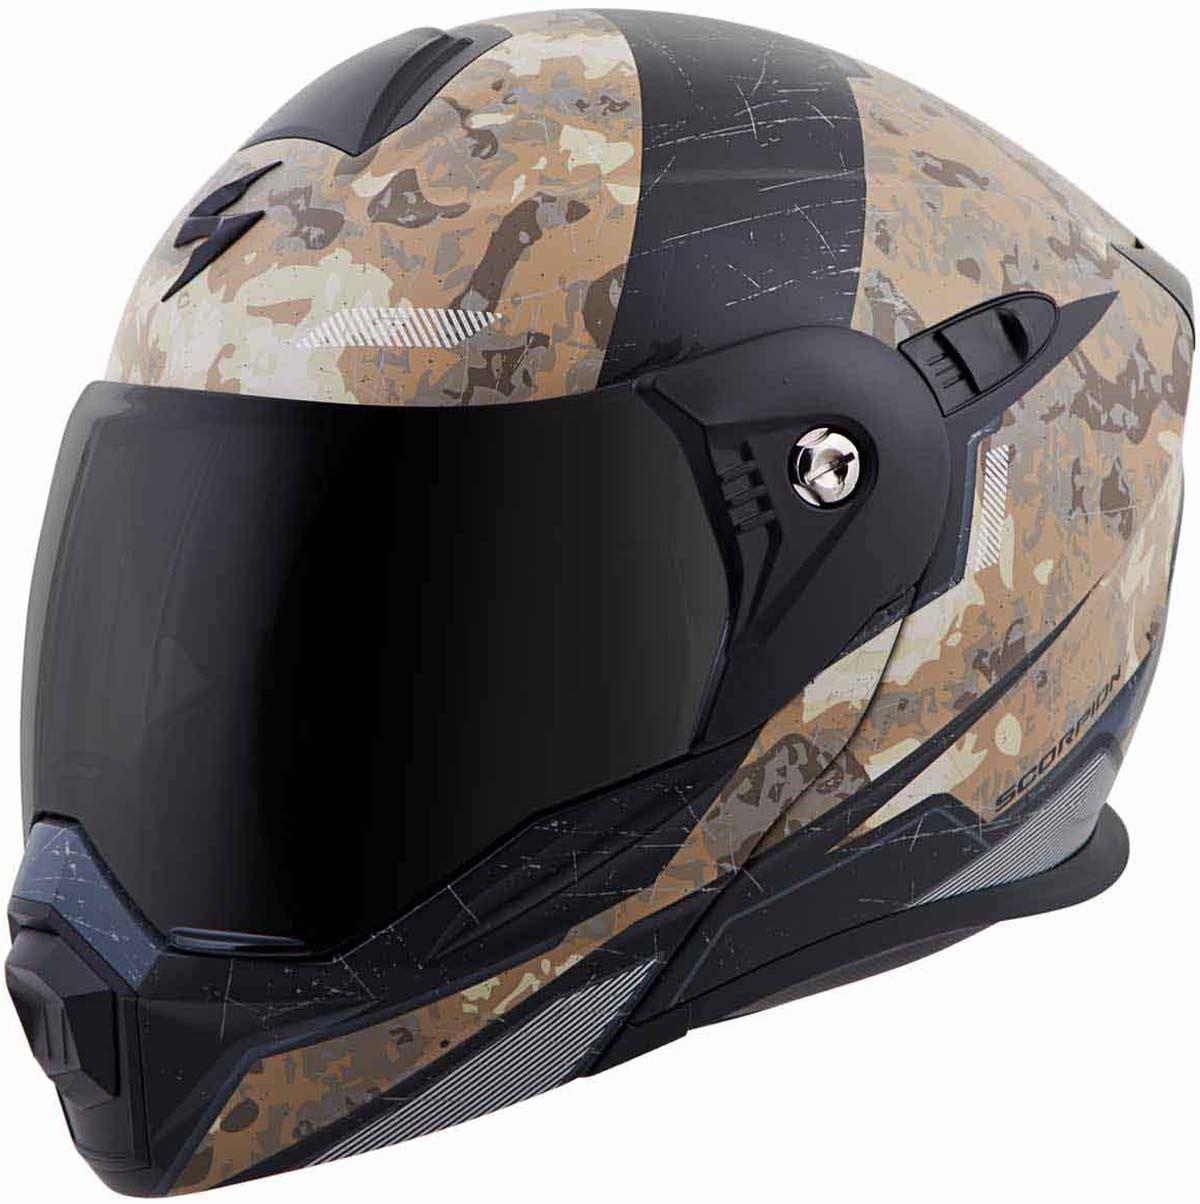 Scorpion-EXO-AT950-Helmet-Flip-Up-Modular-Dual-Sport-Adventure-ADV-DOT-XS-3XL miniature 55